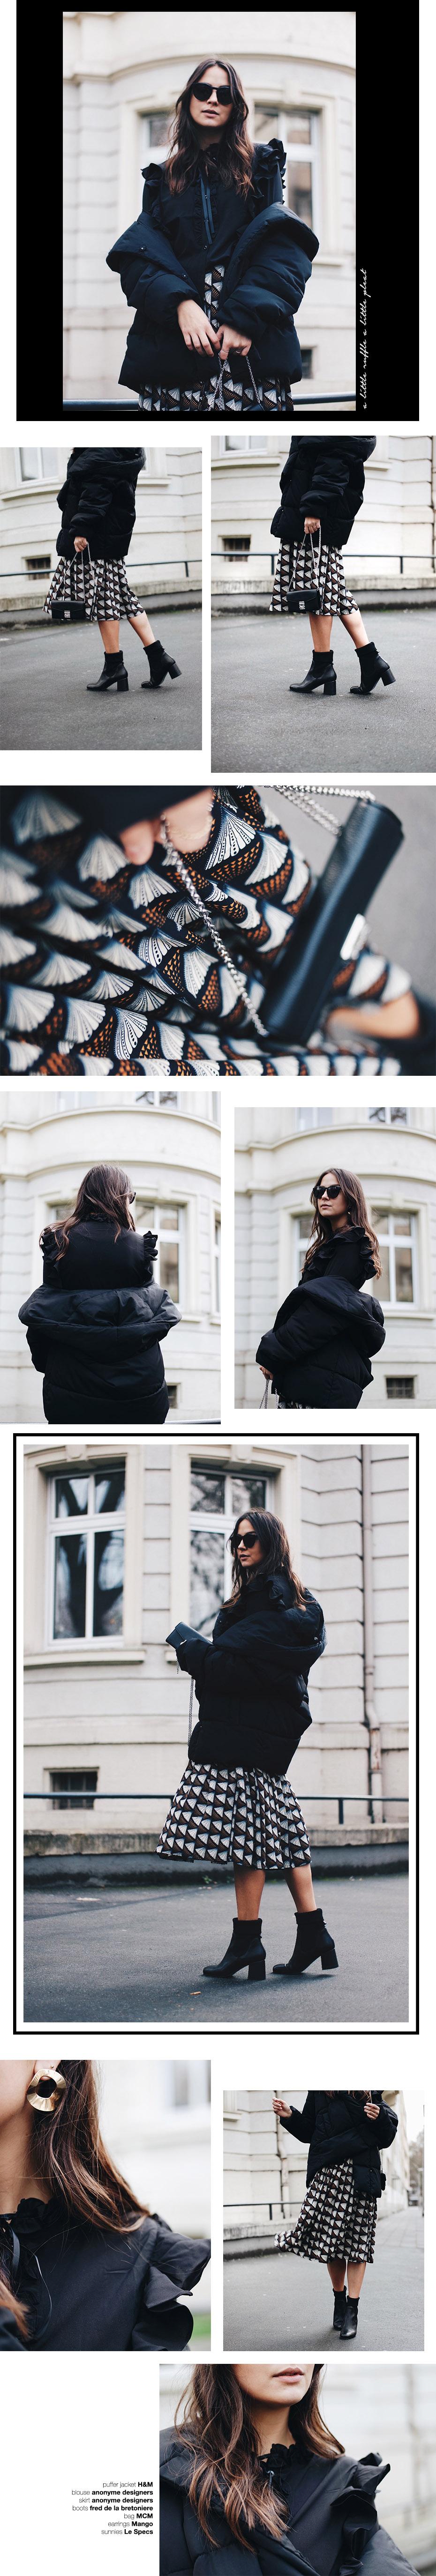 Outfit Fred de la Bretoniere Anonyme Designers